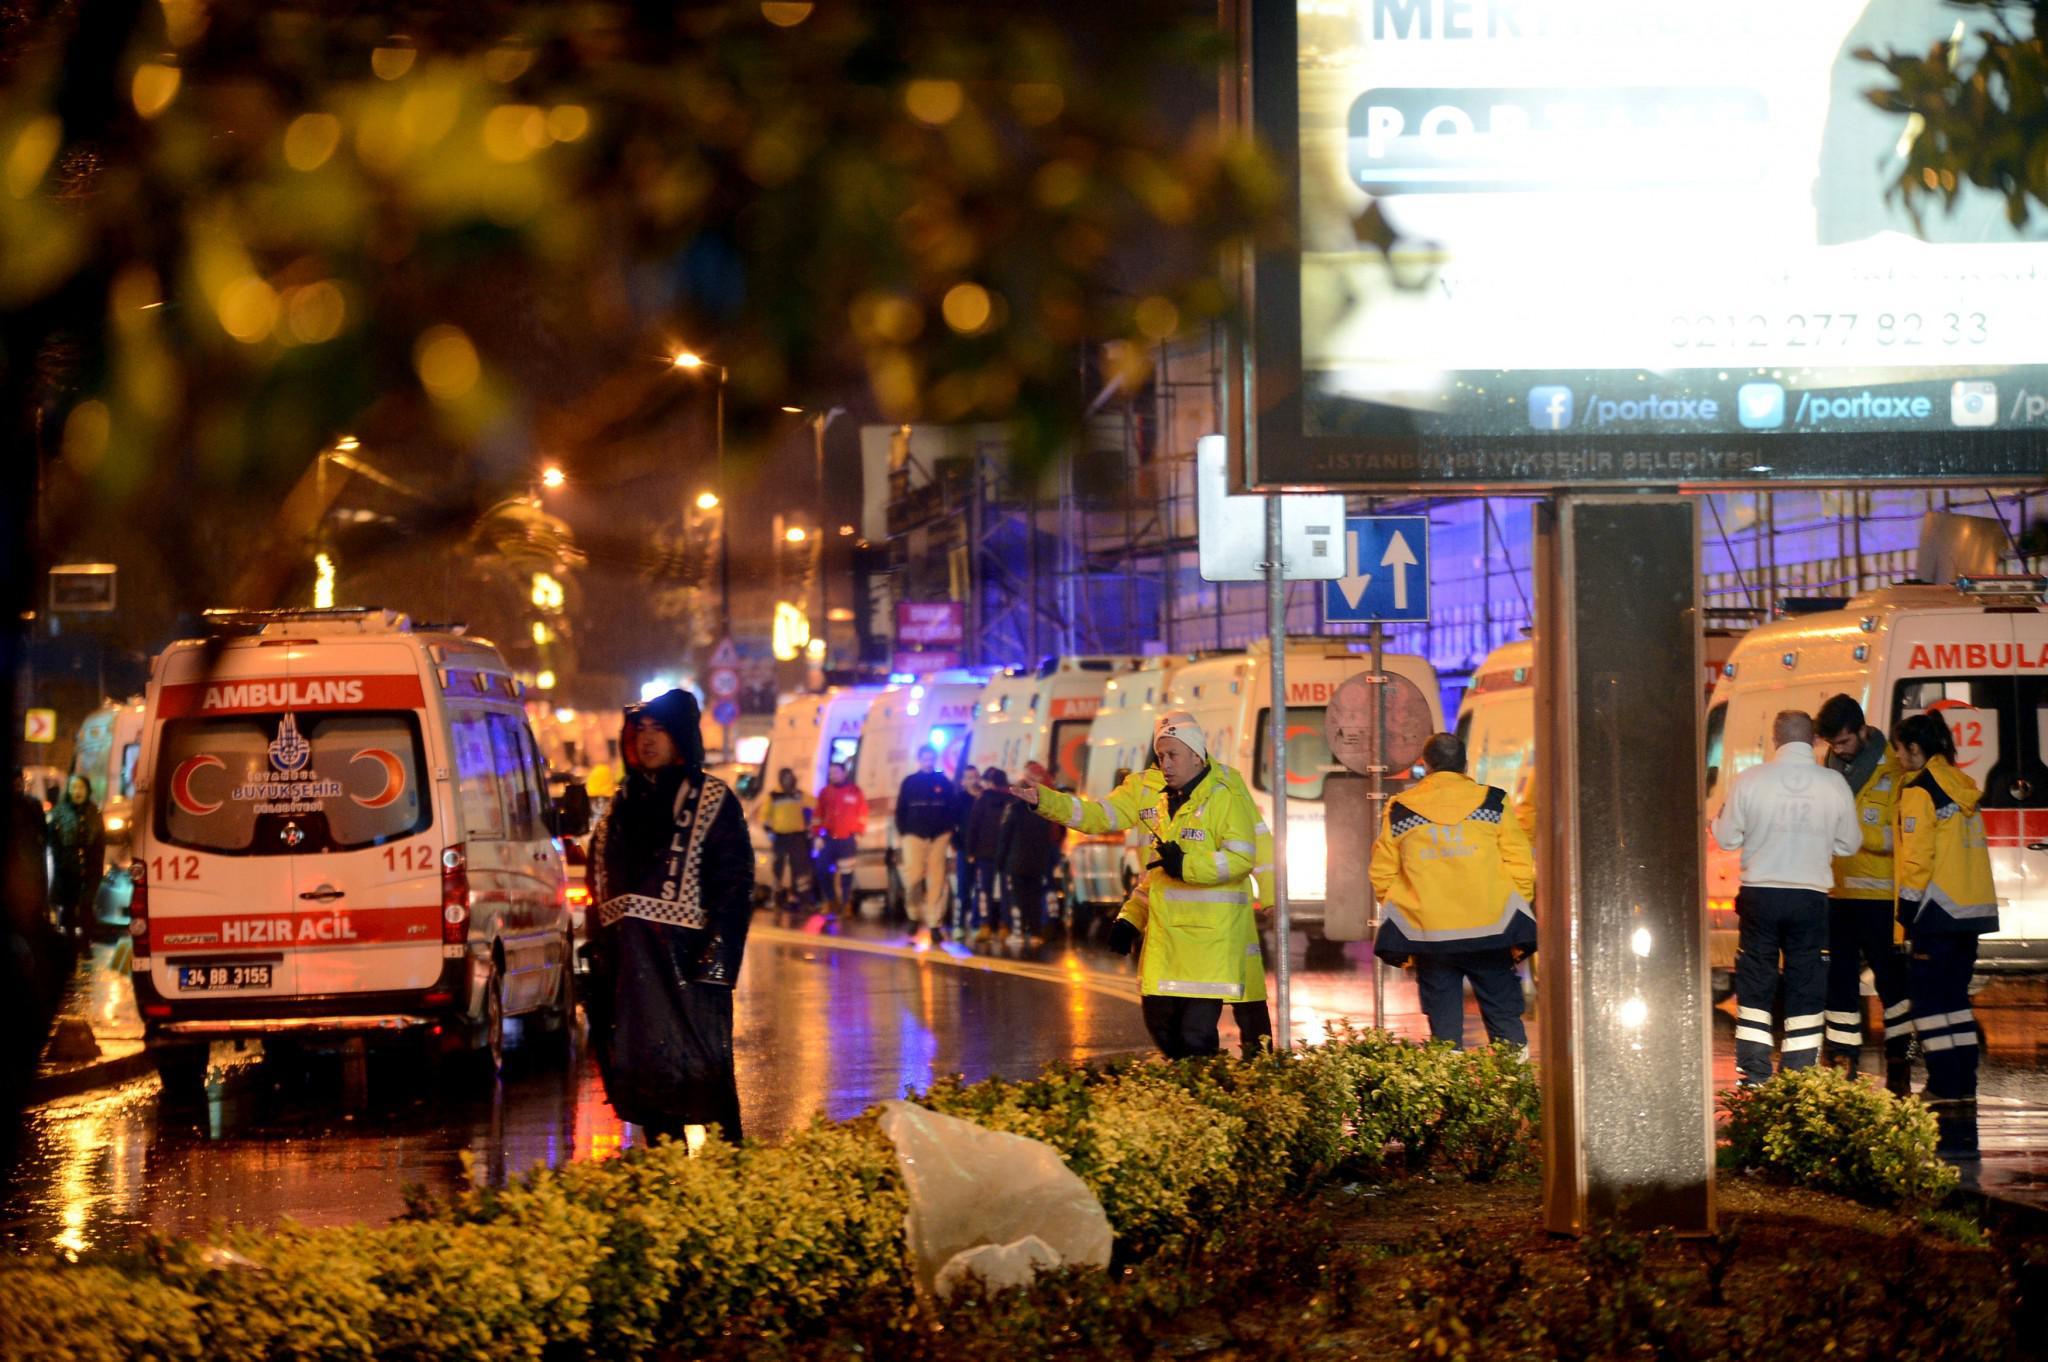 tourkia-epithesi-klamp-nekroi-10 Έτσι σκόρπισε τον θάνατο ο μακελάρης της Κωνσταντινούπολης [εικόνες & βίντεο]